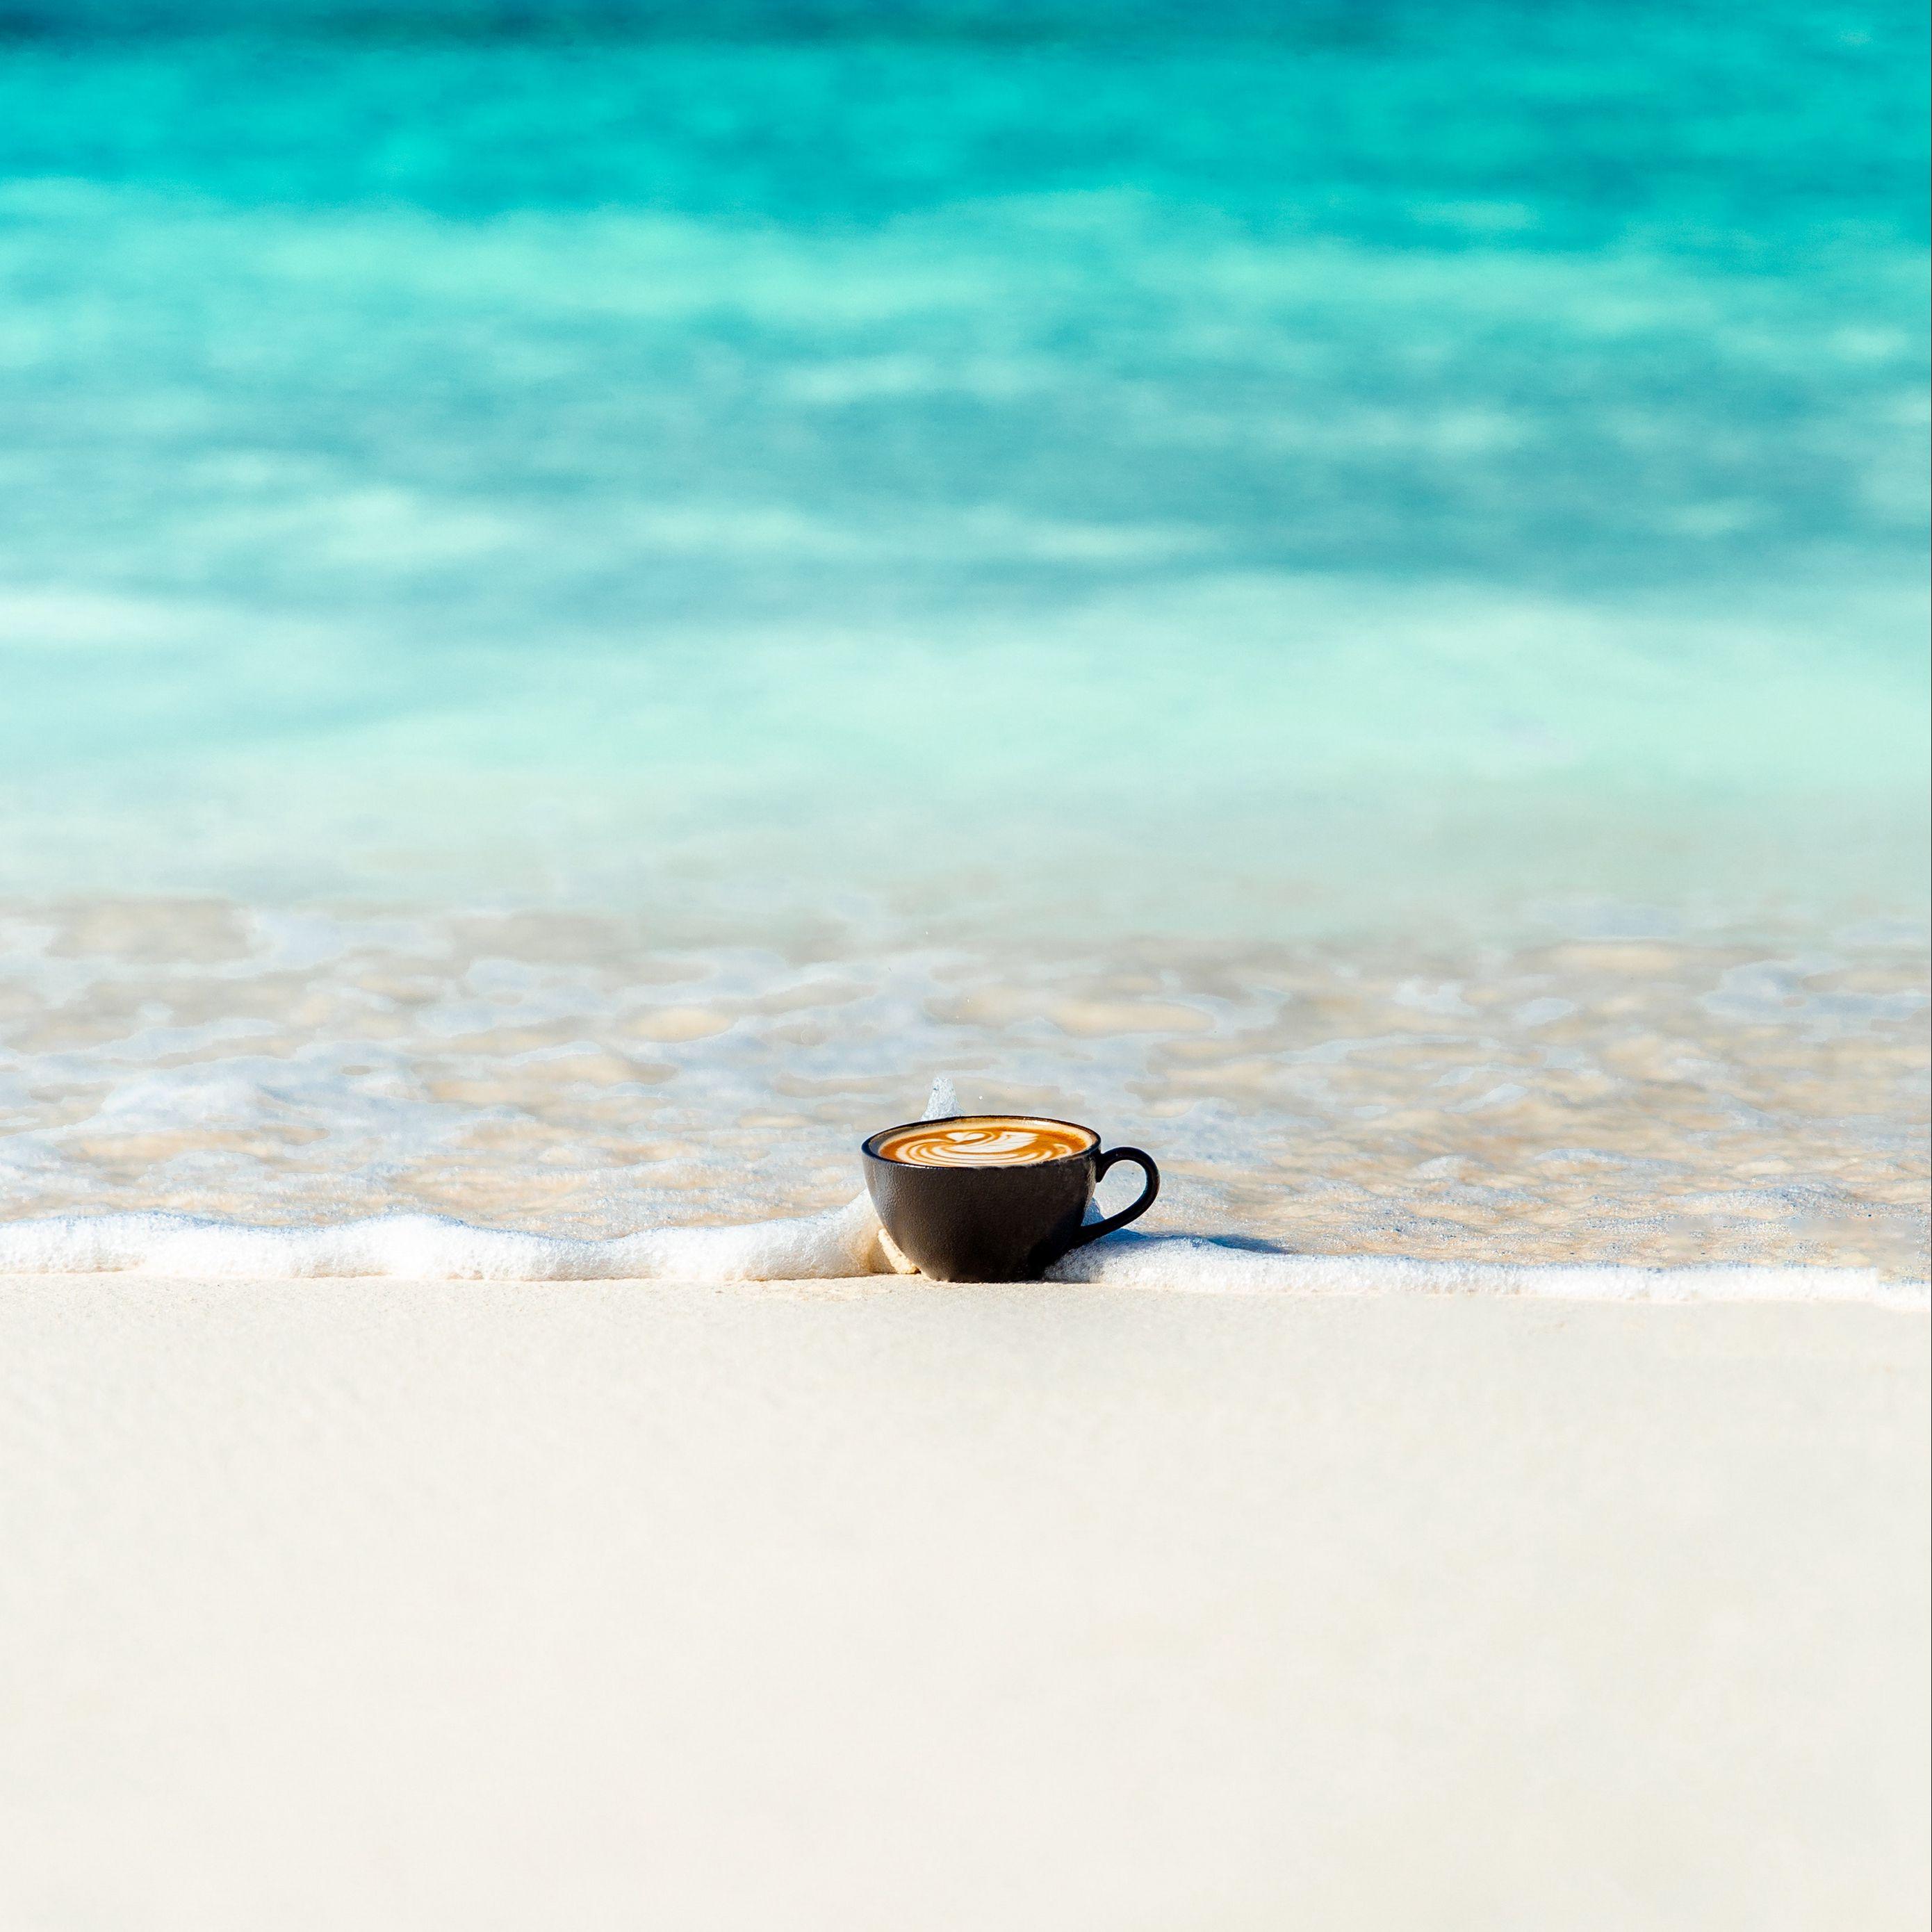 2780x2780 Wallpaper cup, ocean, sand, coast, minimalism